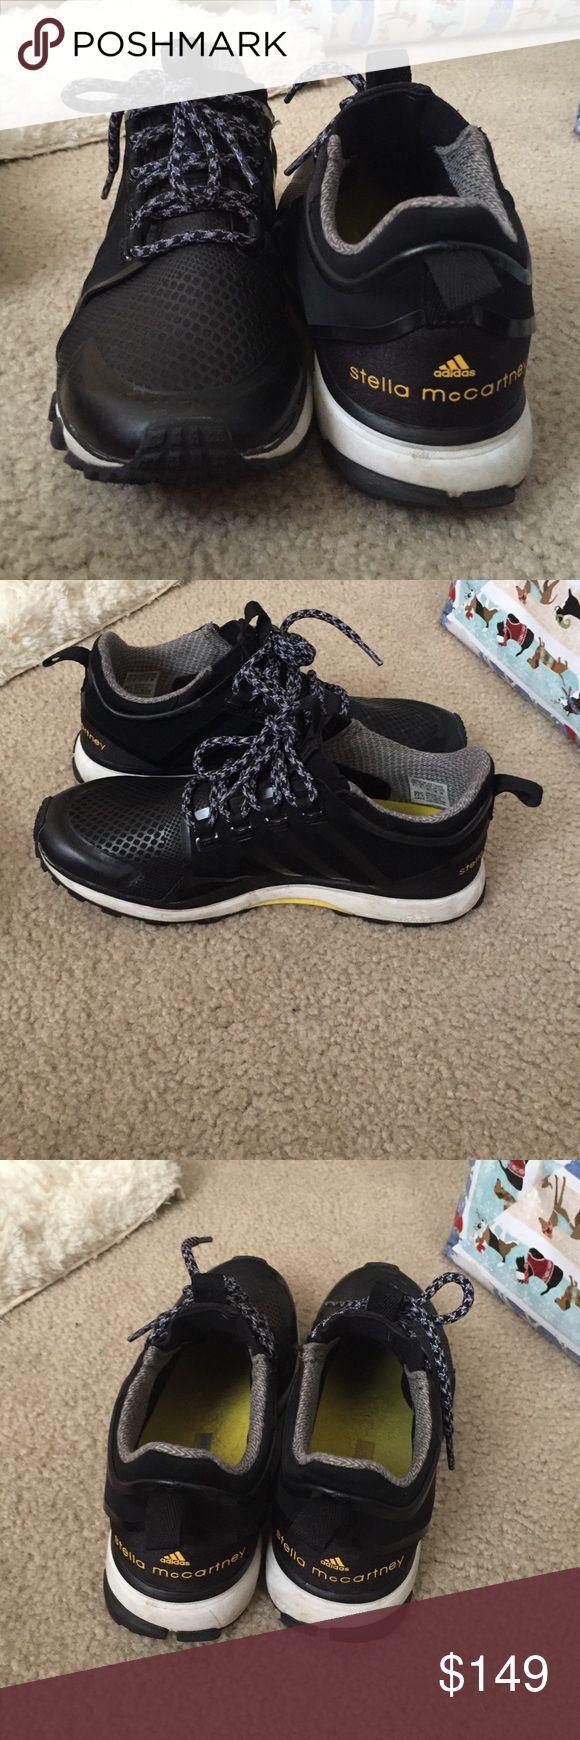 Adidas Stella McCartney Shoes 7.5 Size 7.5 Adidas x Stella McCartney shoes ! Worn about 5 times . Great condition! Slight wear. Very comfortable ! Adidas by Stella McCartney Shoes Athletic Shoes